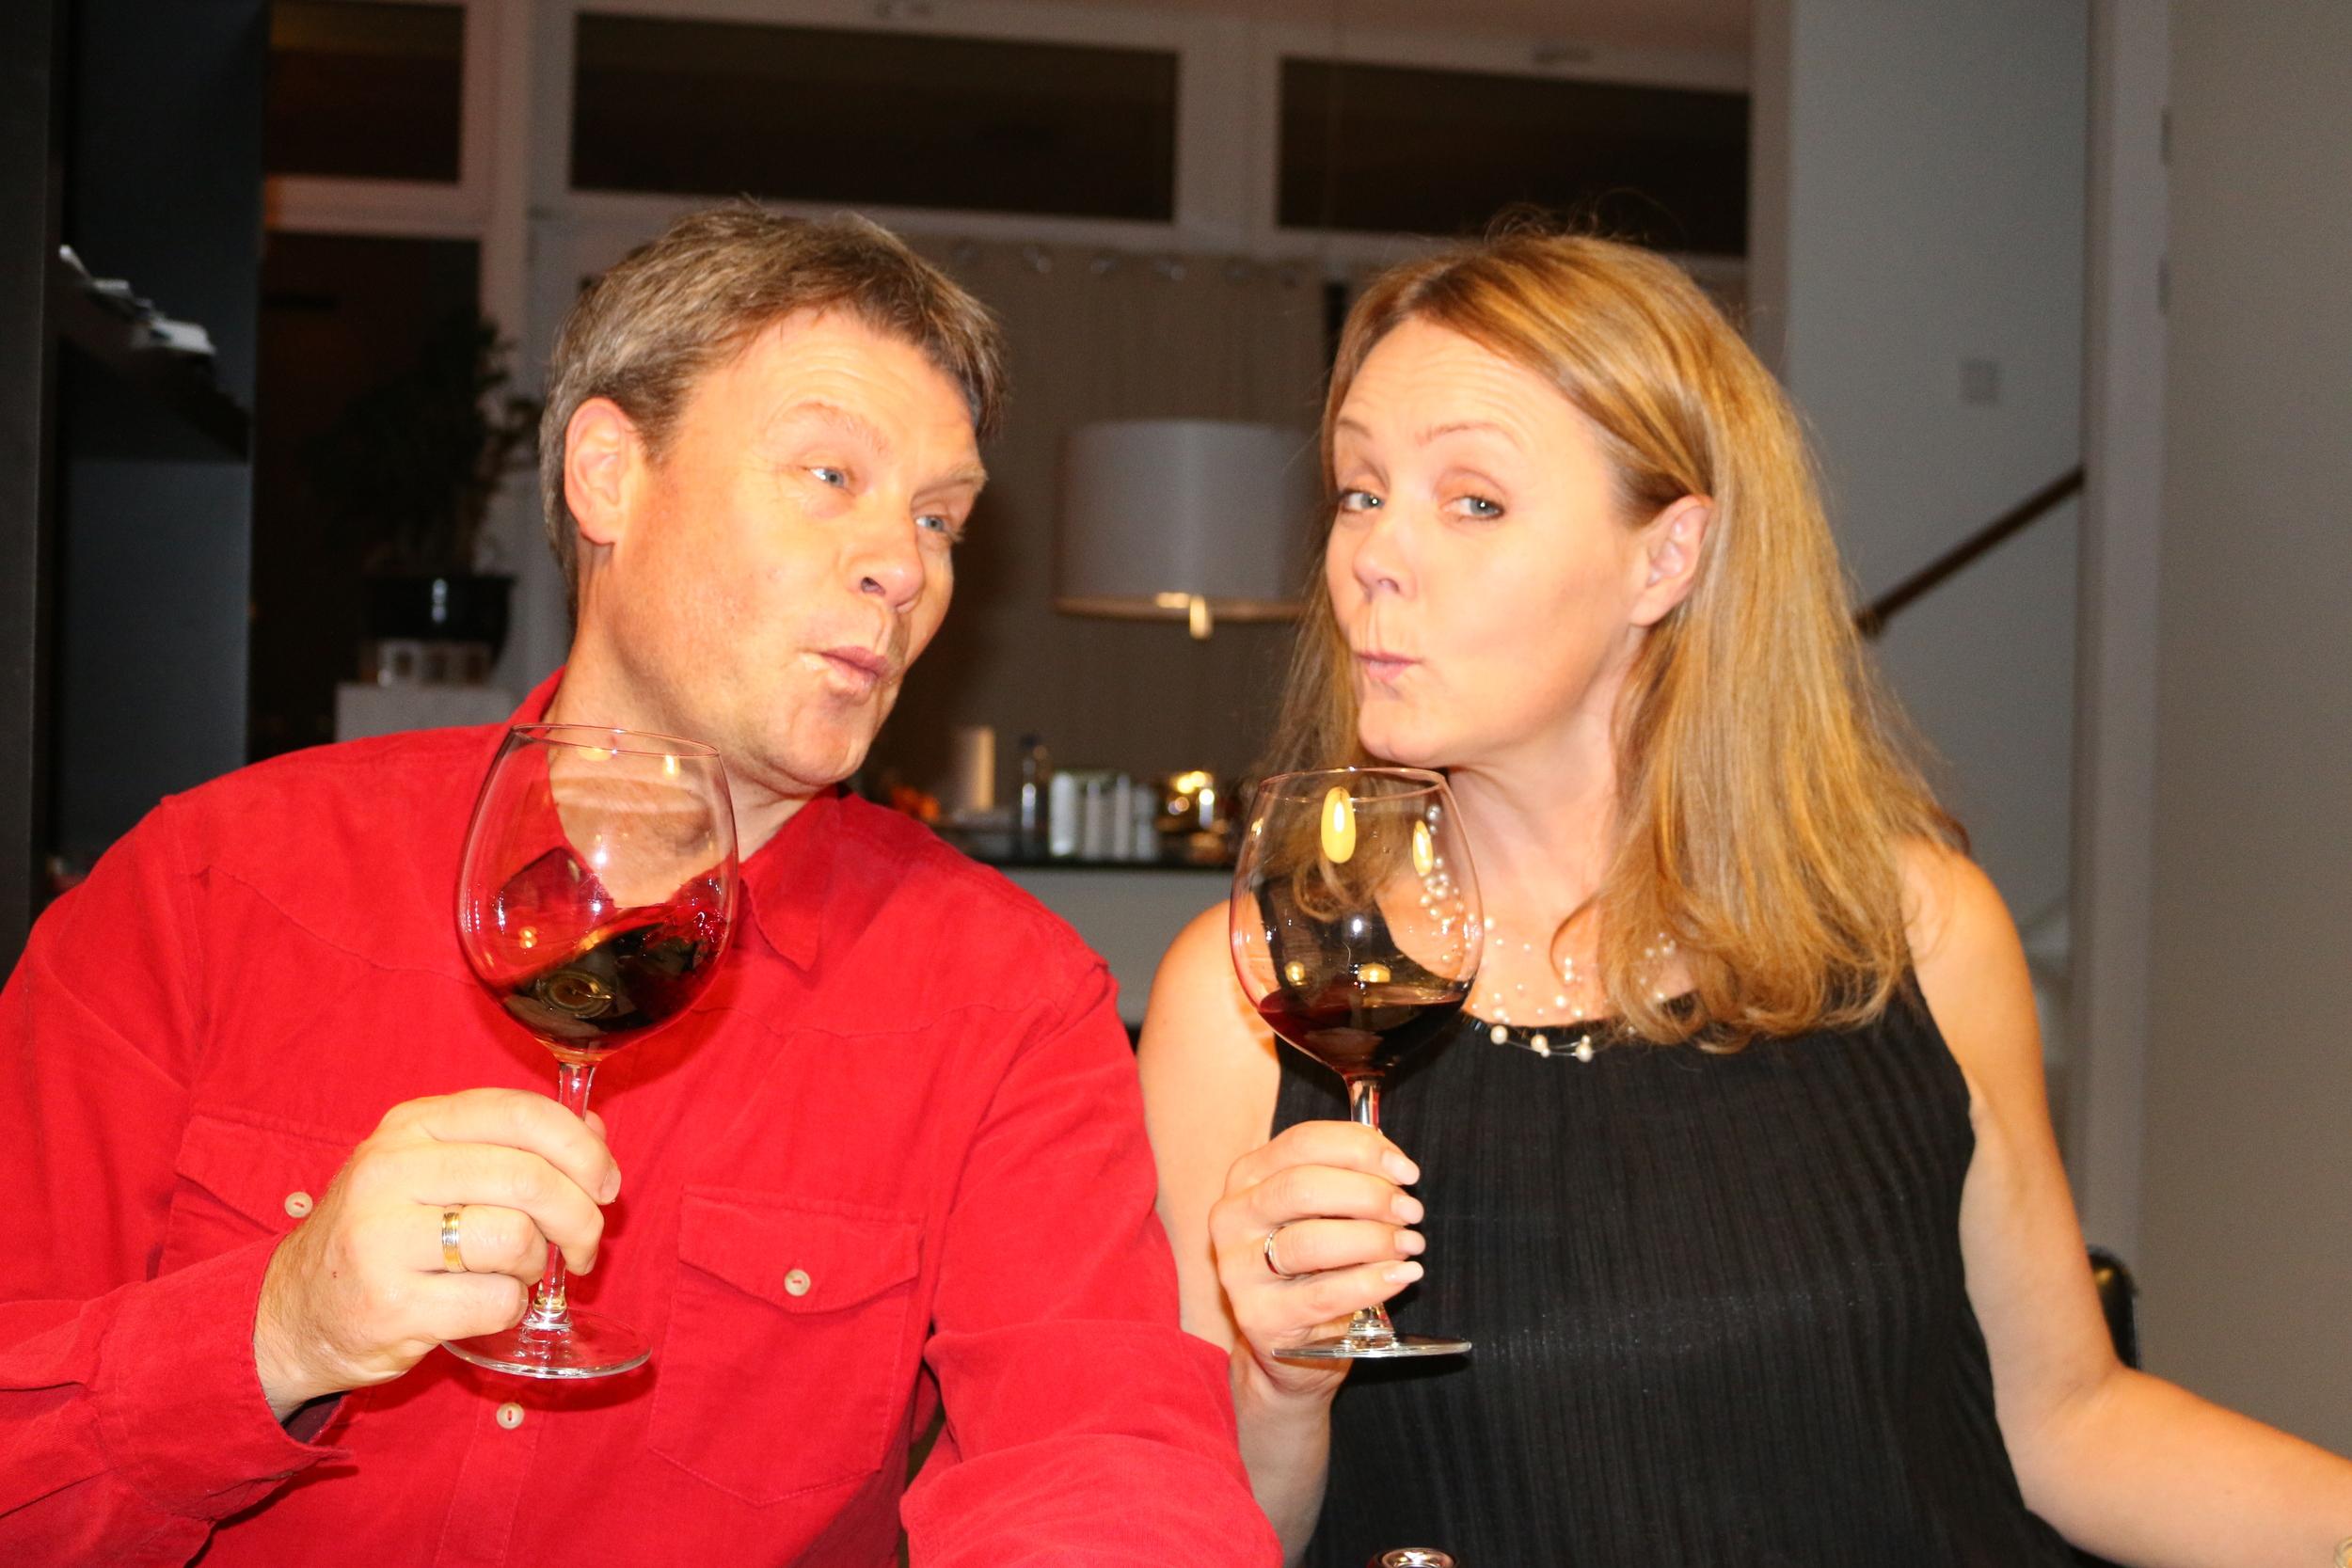 uuu.. fine wine :-)